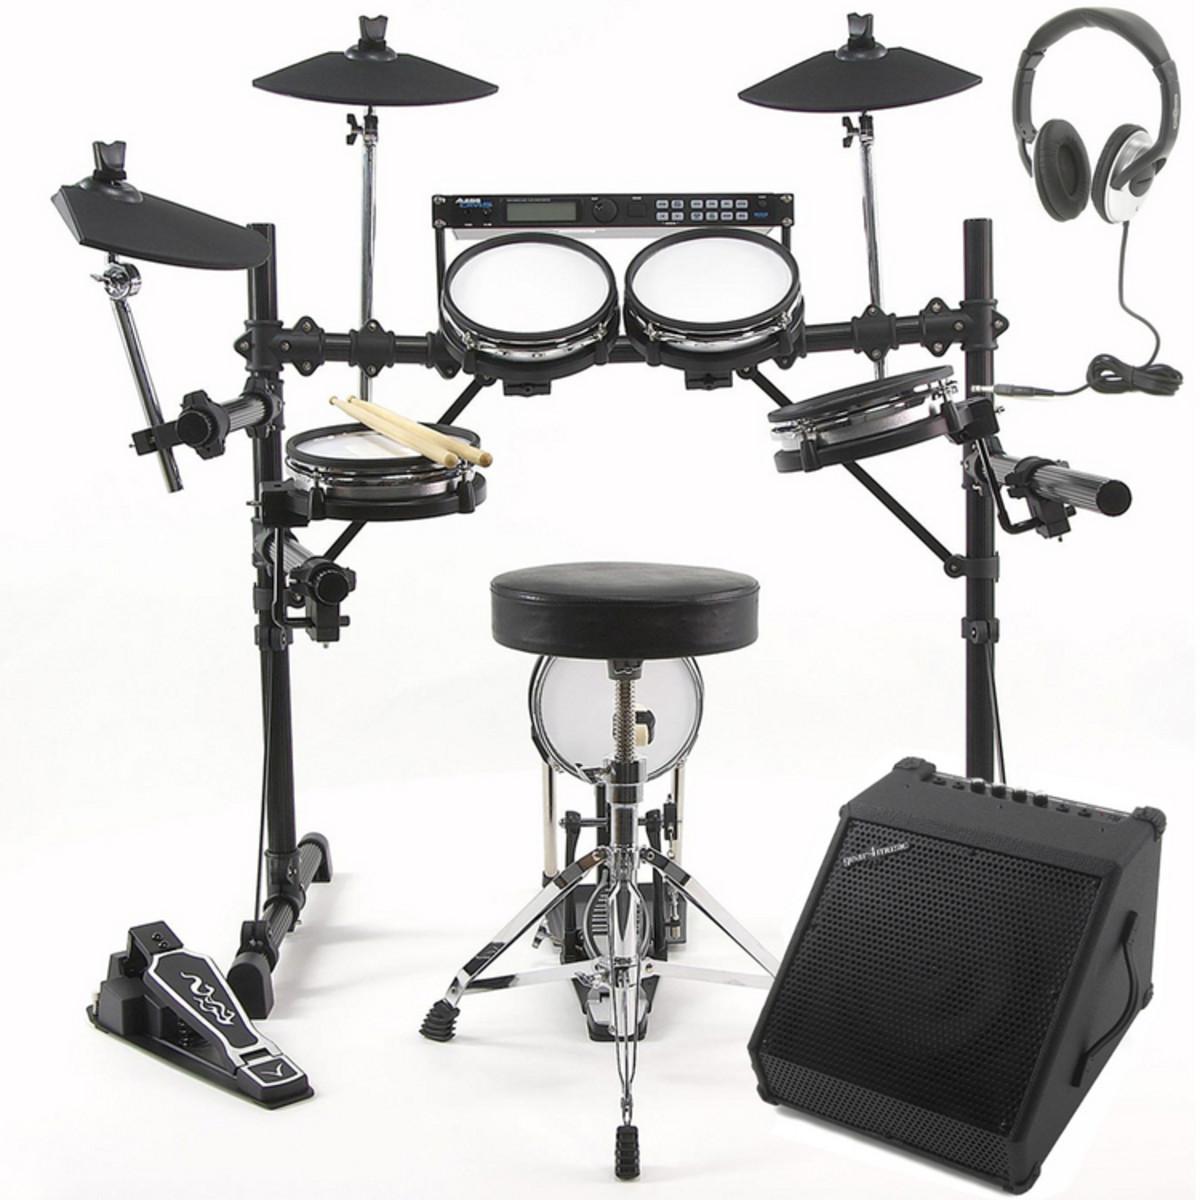 Alesis DM5 Pro Drum Kit Amp Package Deal